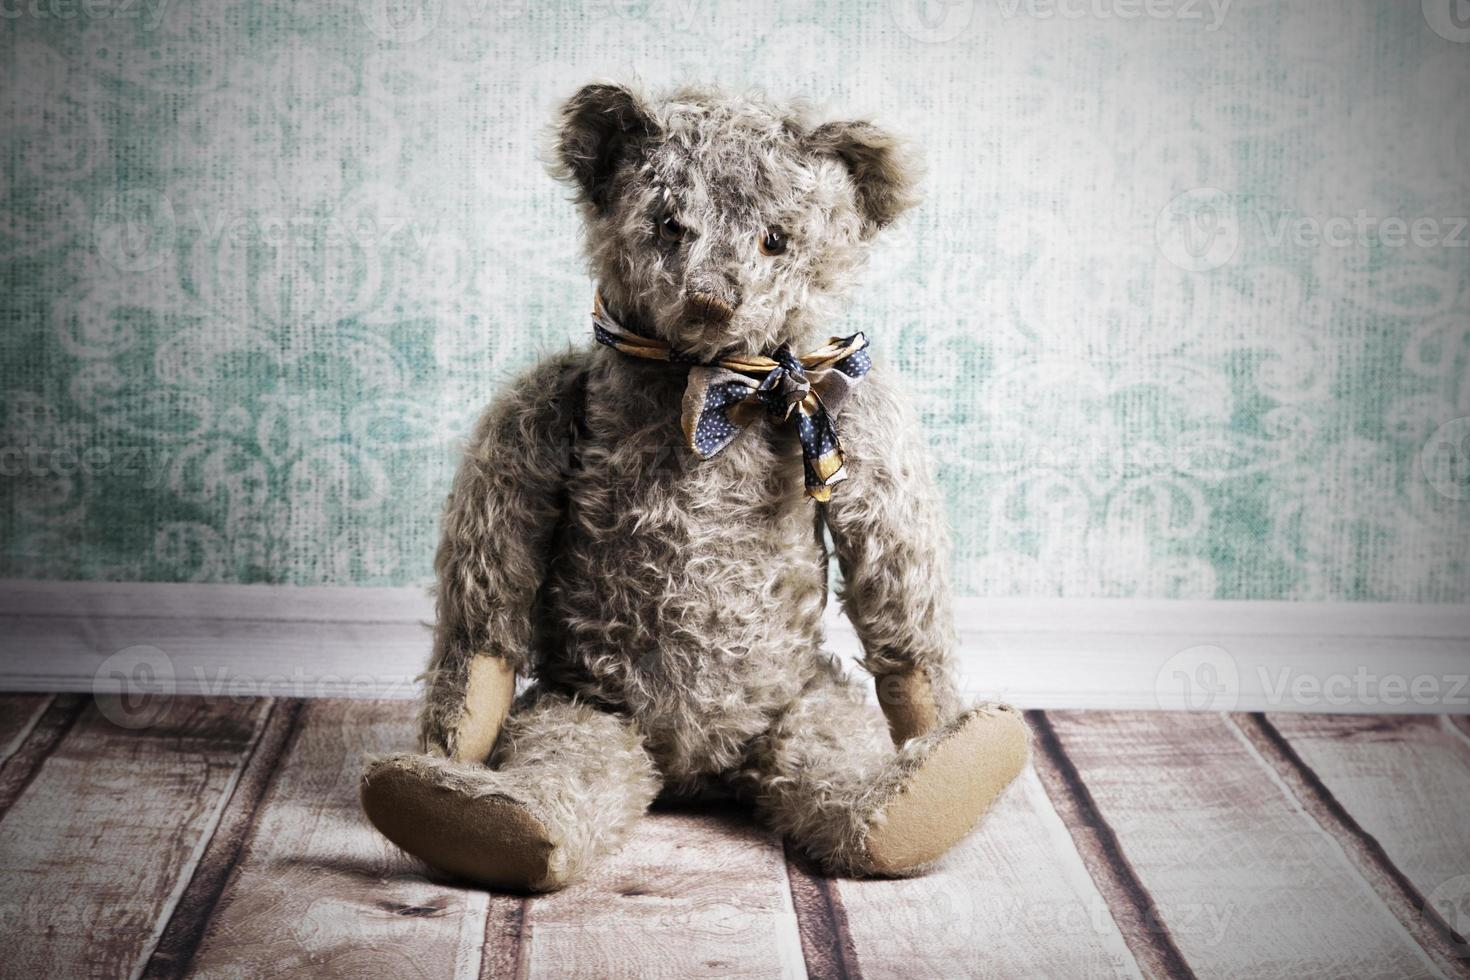 Vintage Teddy bear photo